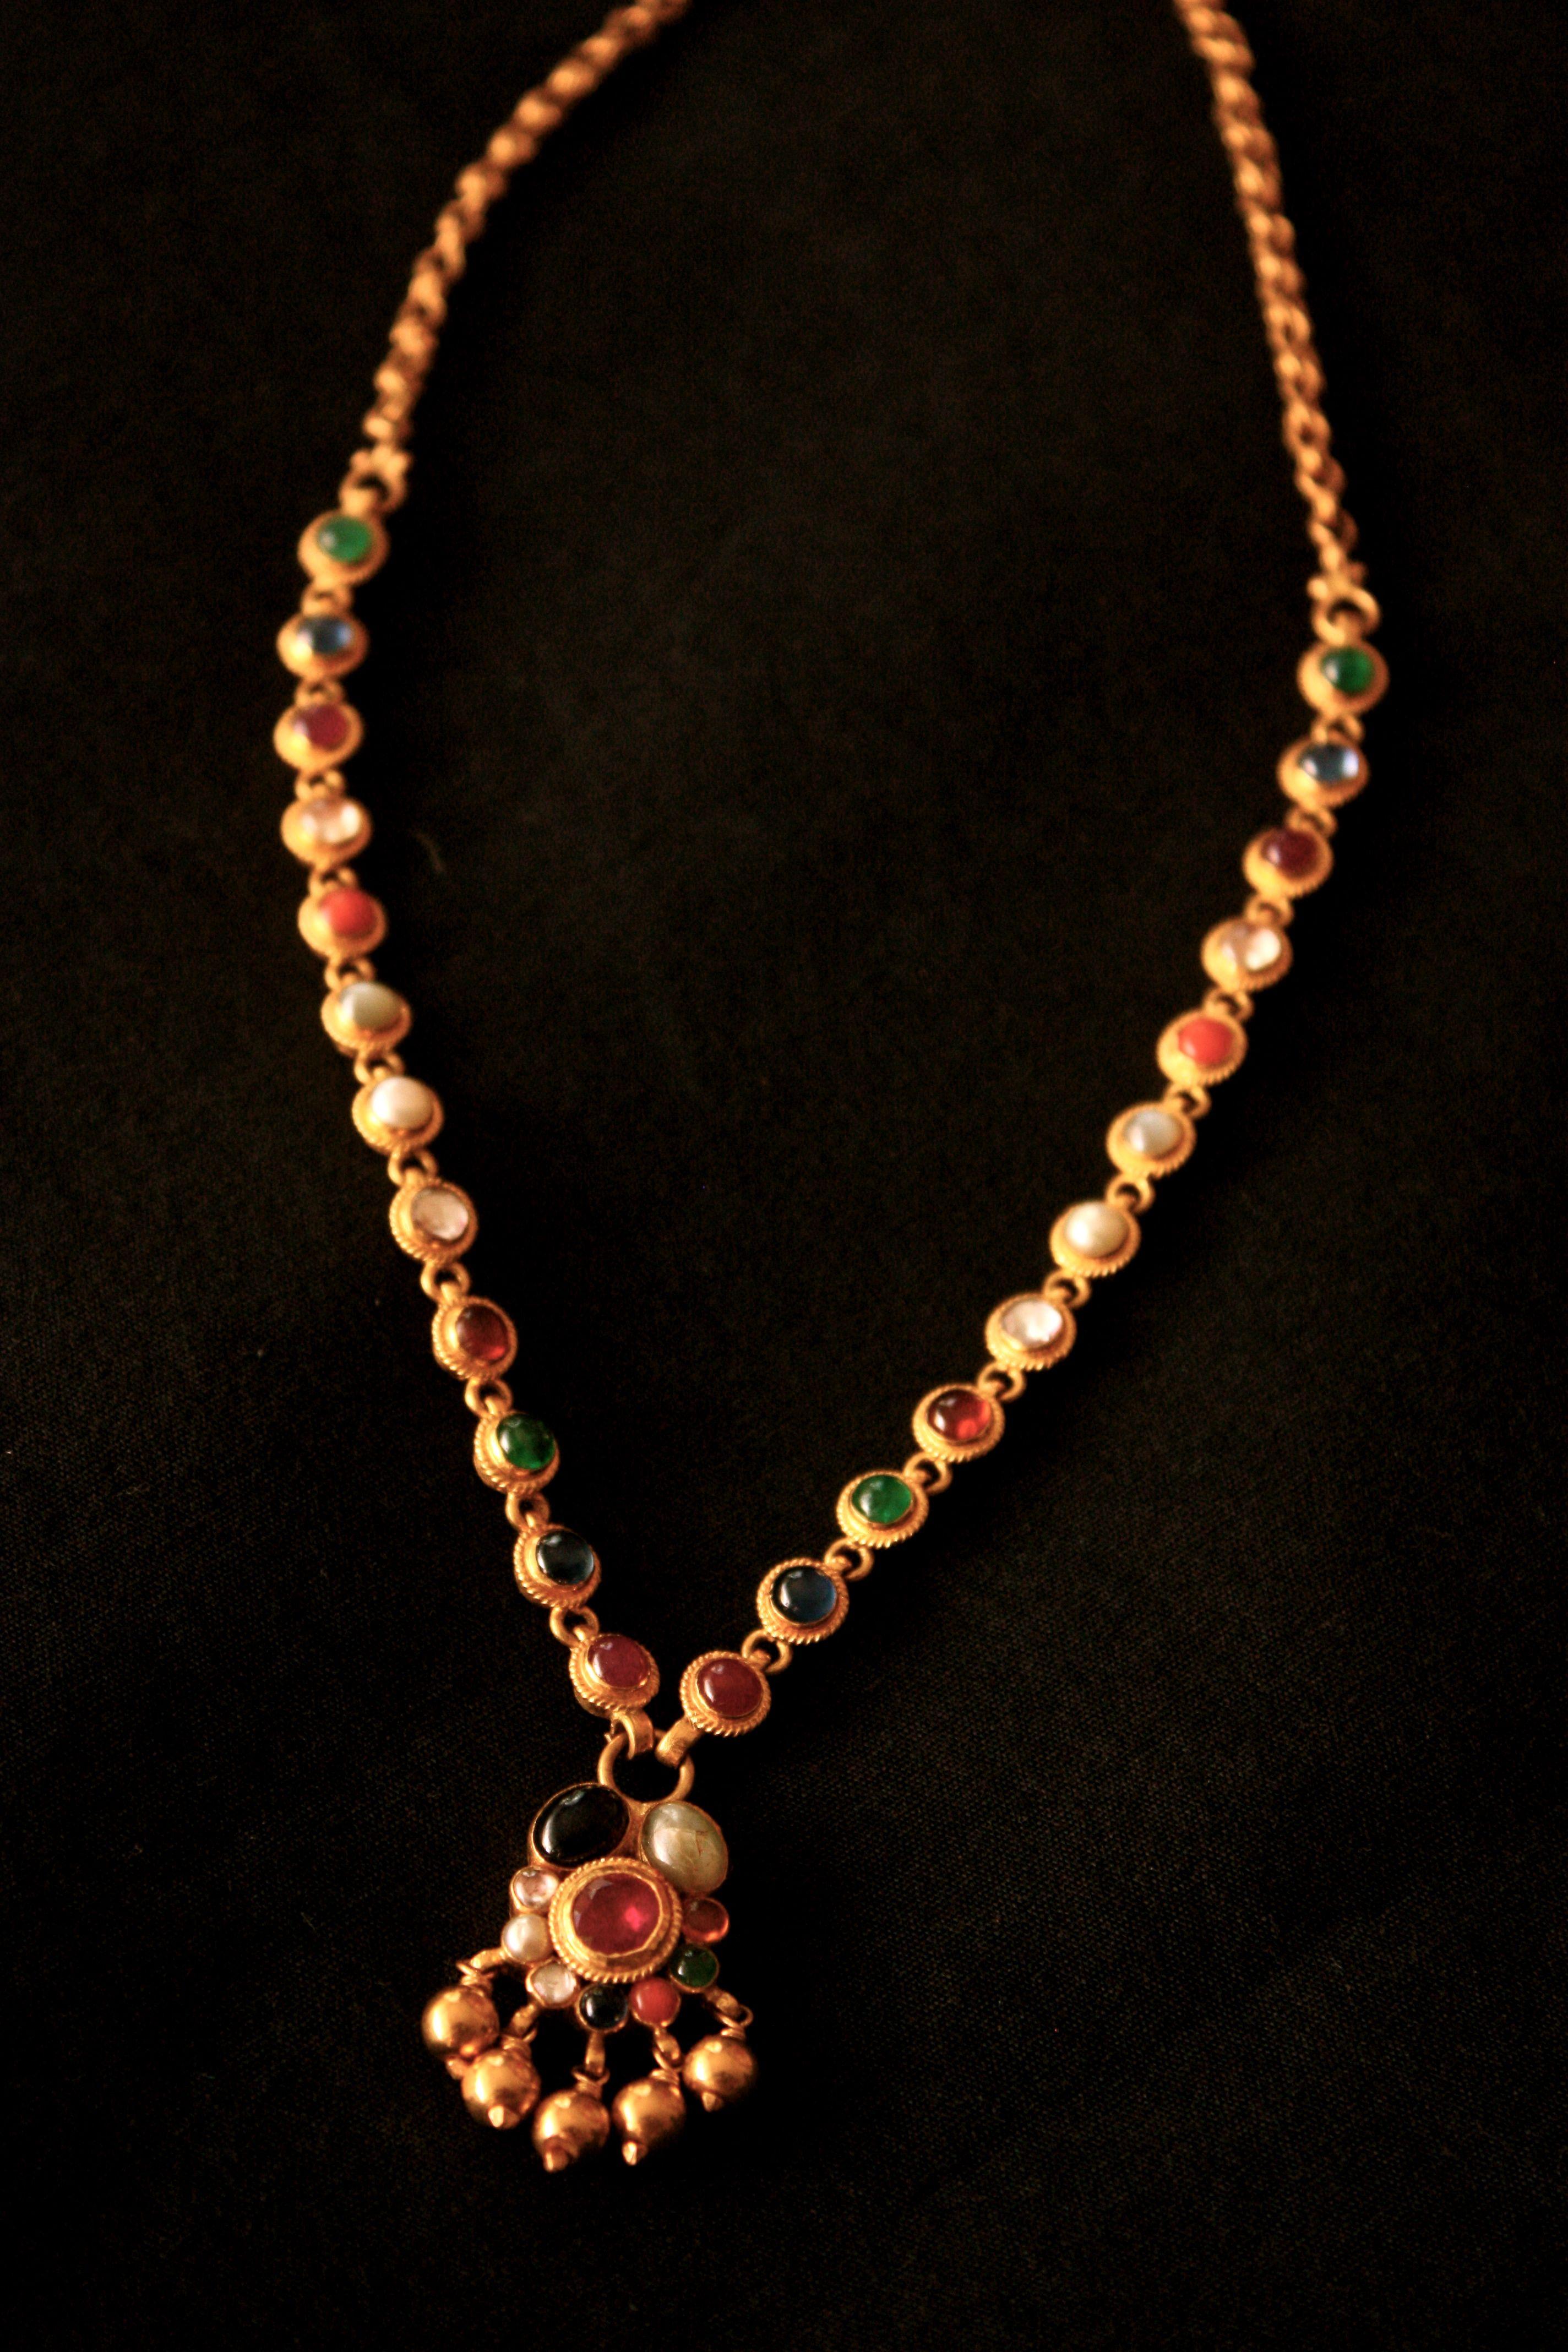 Simple Navratan Necklace | Jewelry | Pinterest | Indian jewelry ...